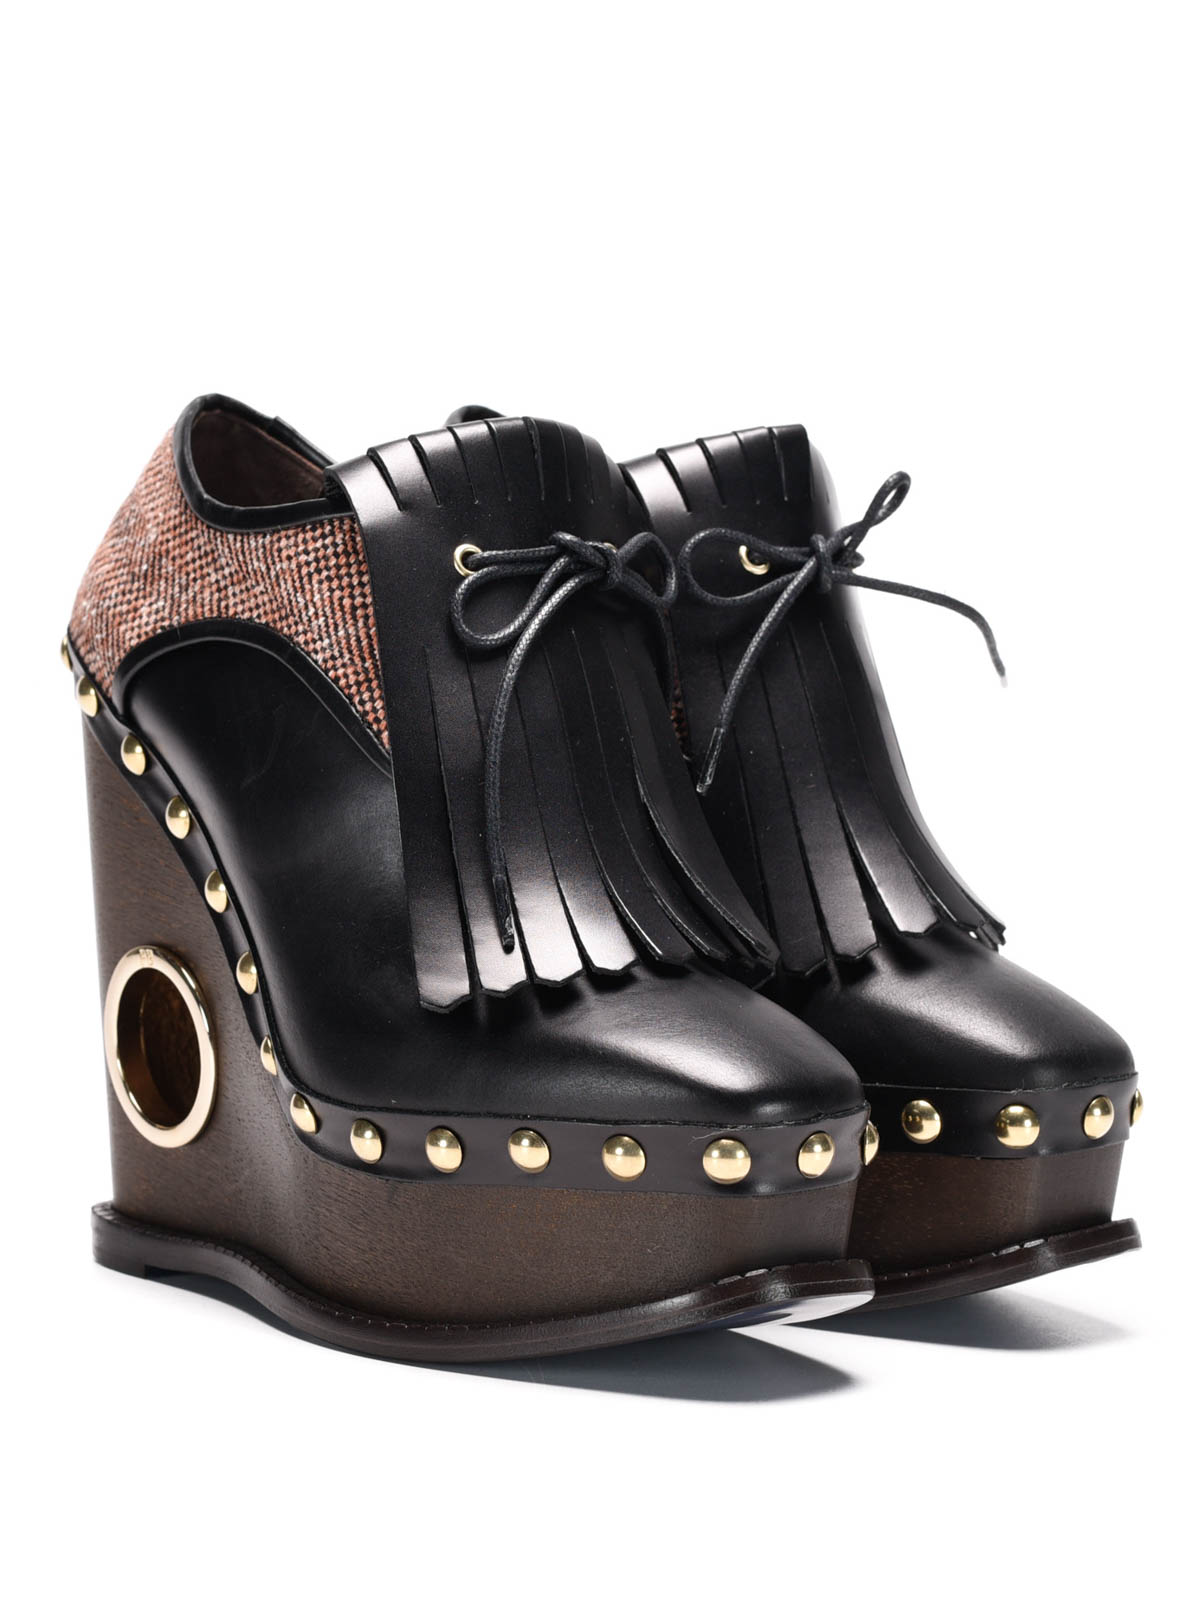 brand new e99f7 6b695 Paloma Barcelò - Francesine con zeppa Orense - scarpe ...